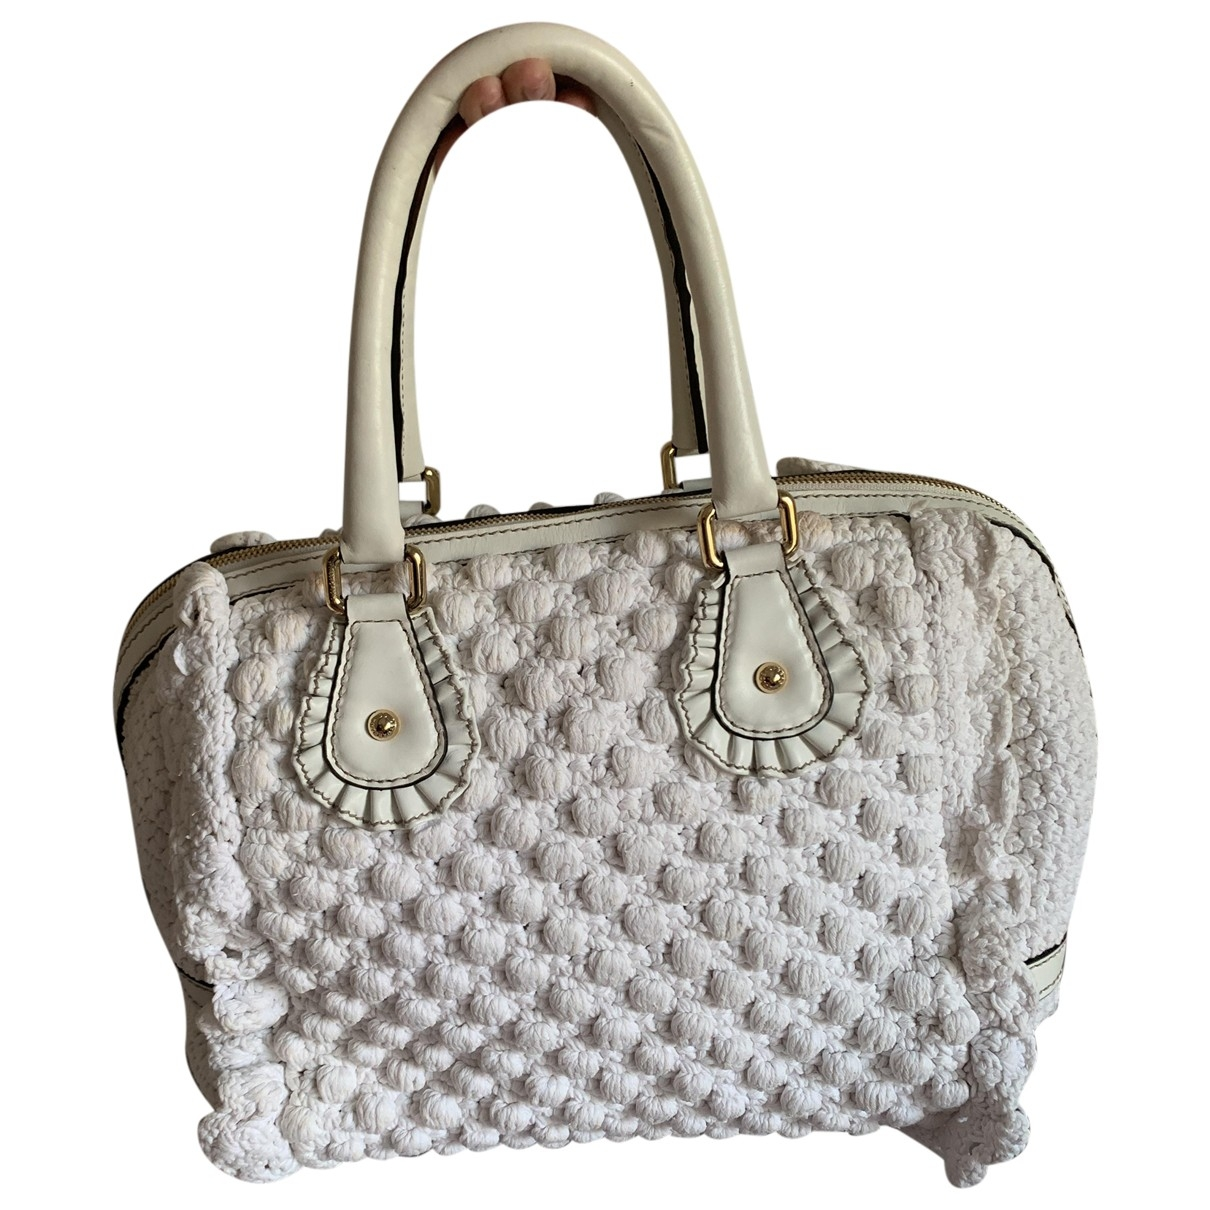 Dolce & Gabbana \N White Wool handbag for Women \N